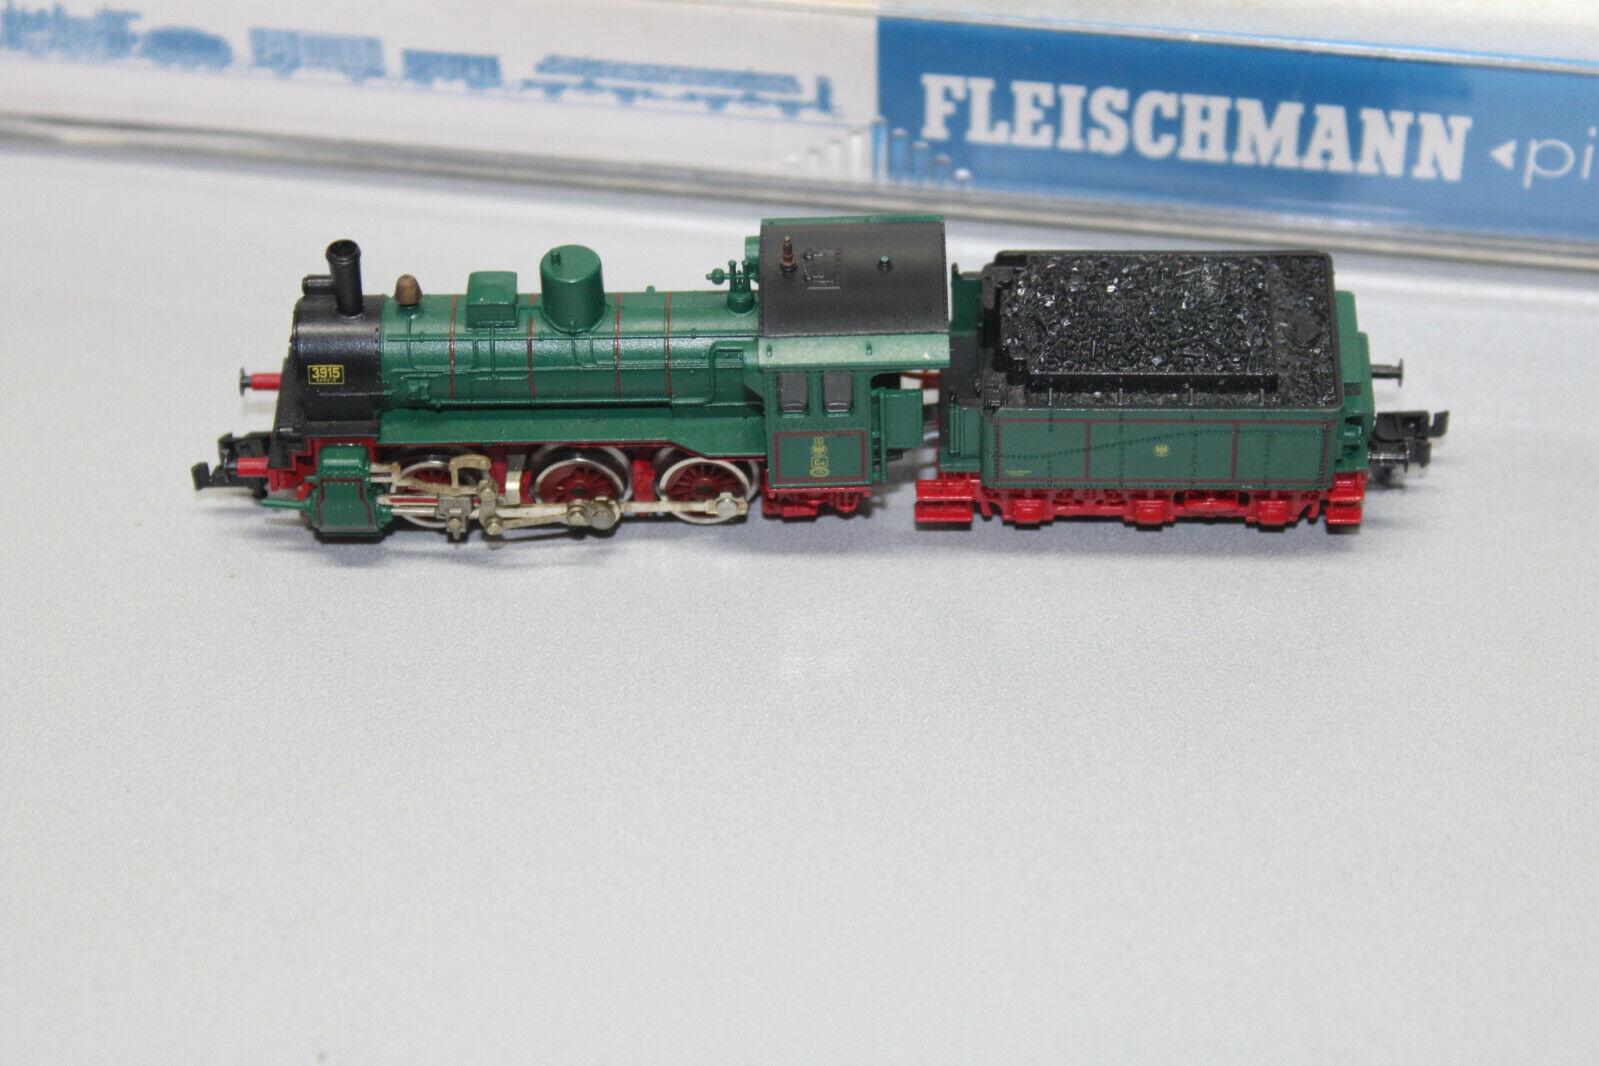 Fleischmann 7812 Locomotora de Vapor G4 Kpev Escala N Emb.orig